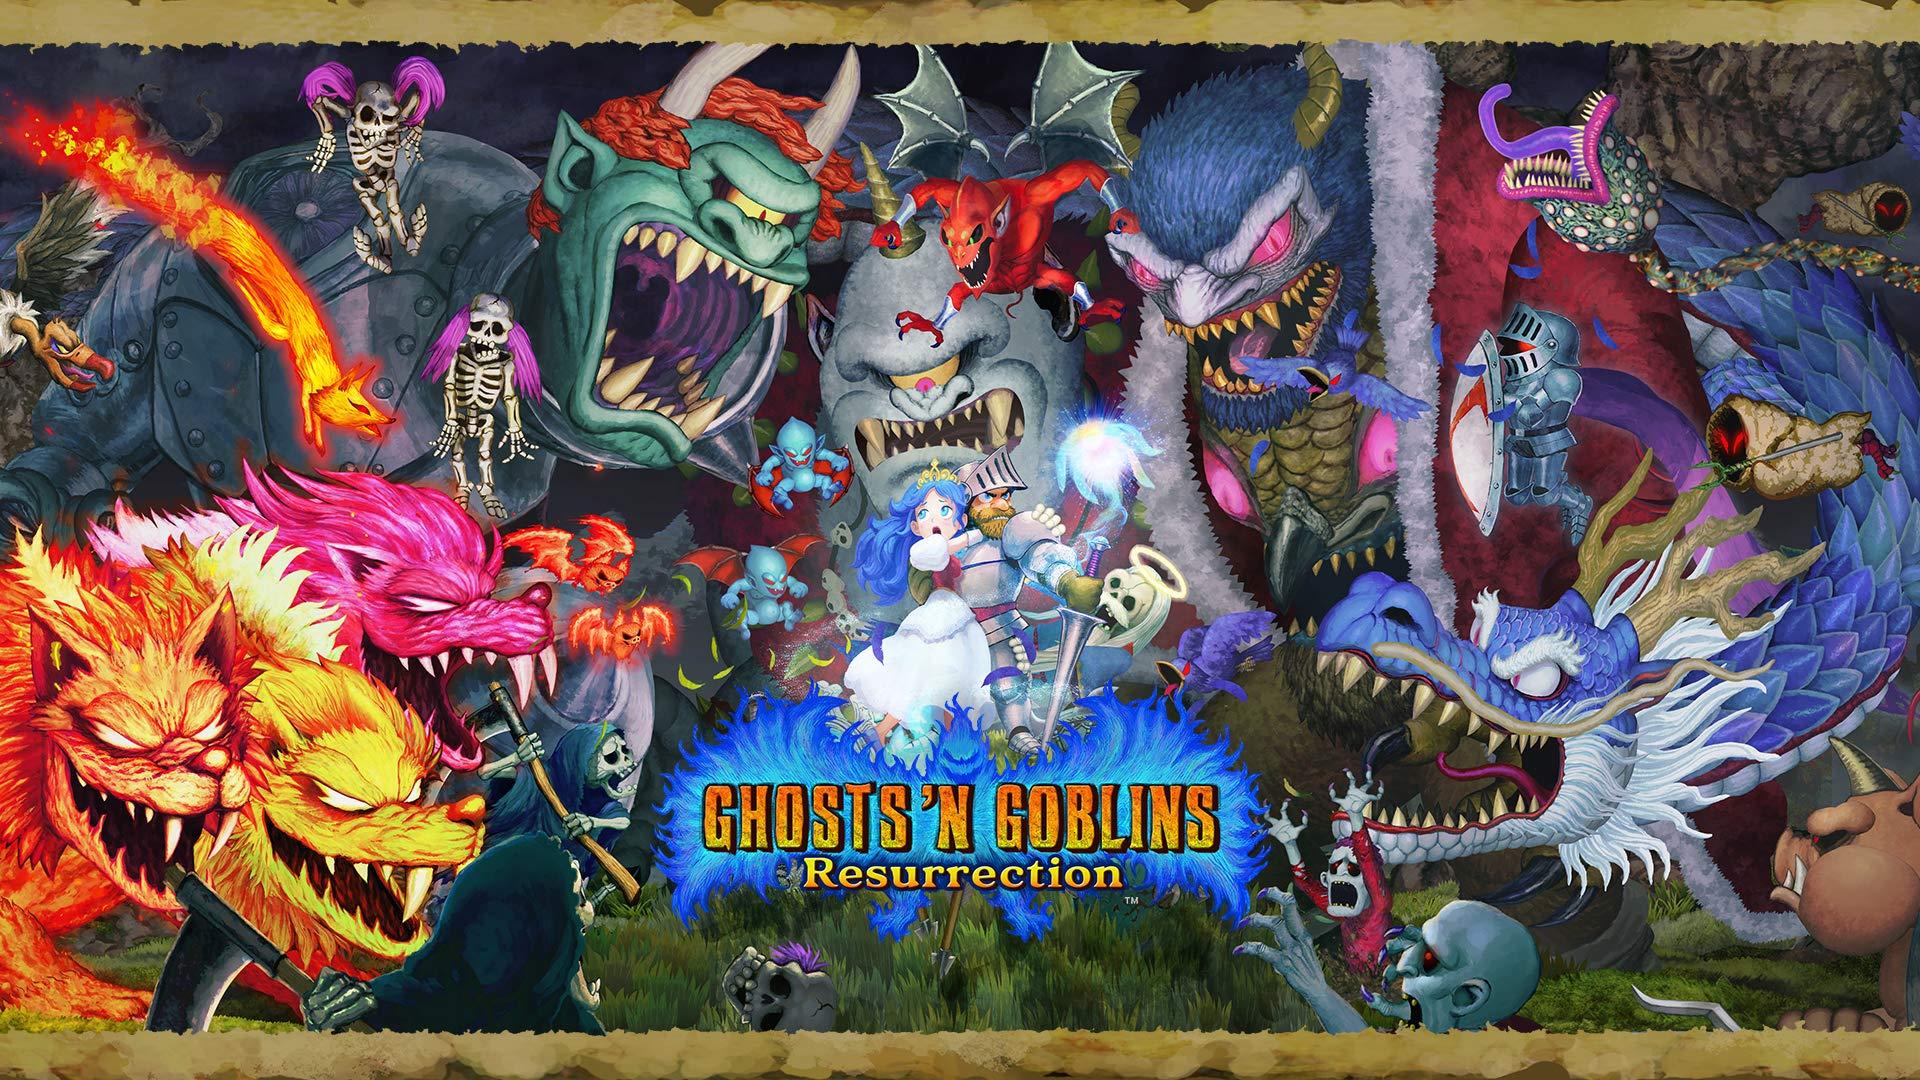 Poster. Ghosts n' Goblins Resurrection